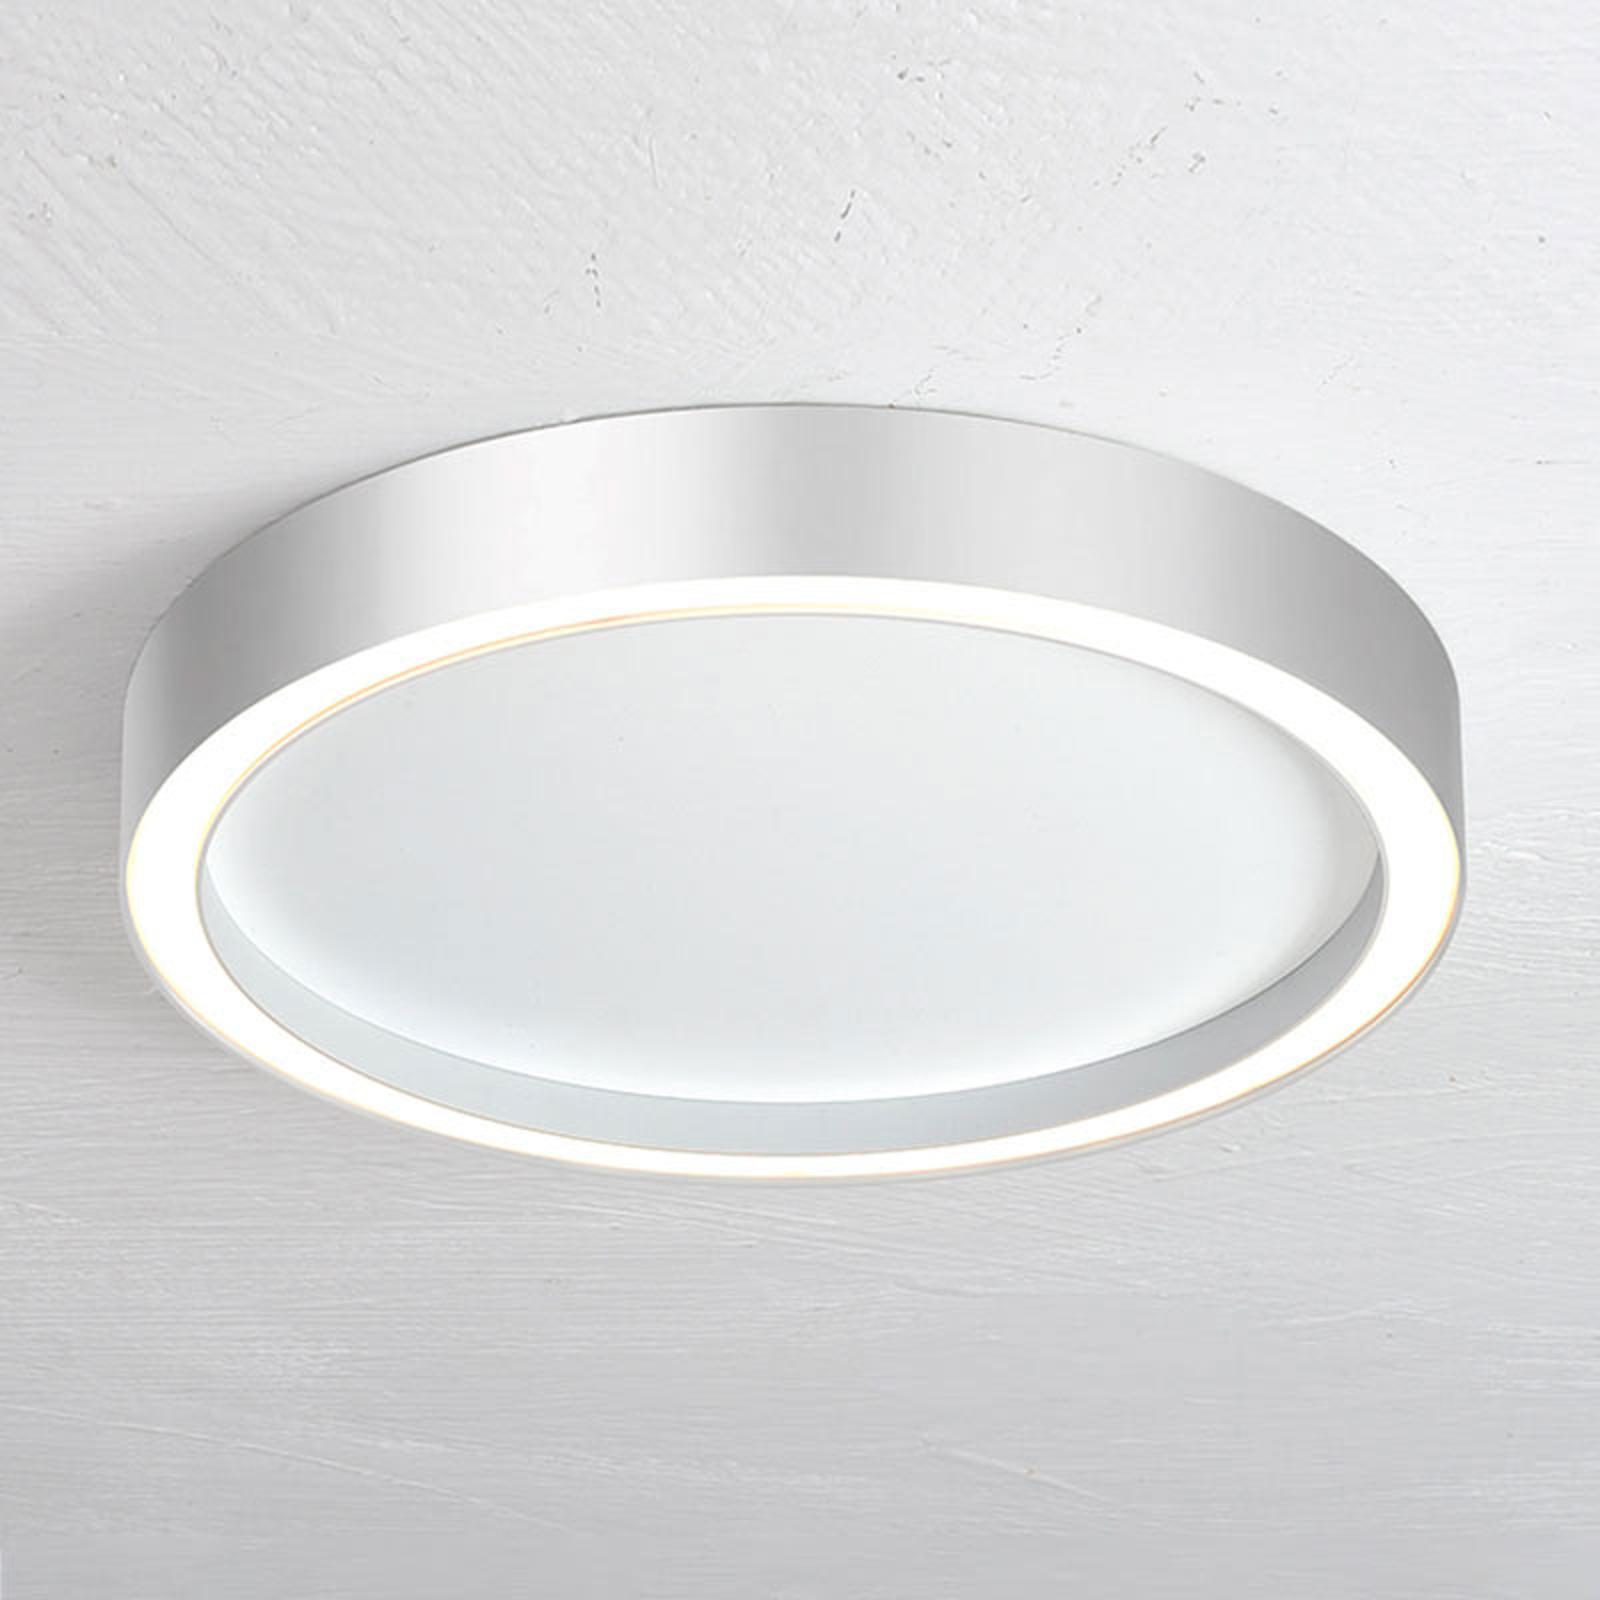 Bopp Aura LED-Deckenlampe Ø 40cm weiß/aluminium